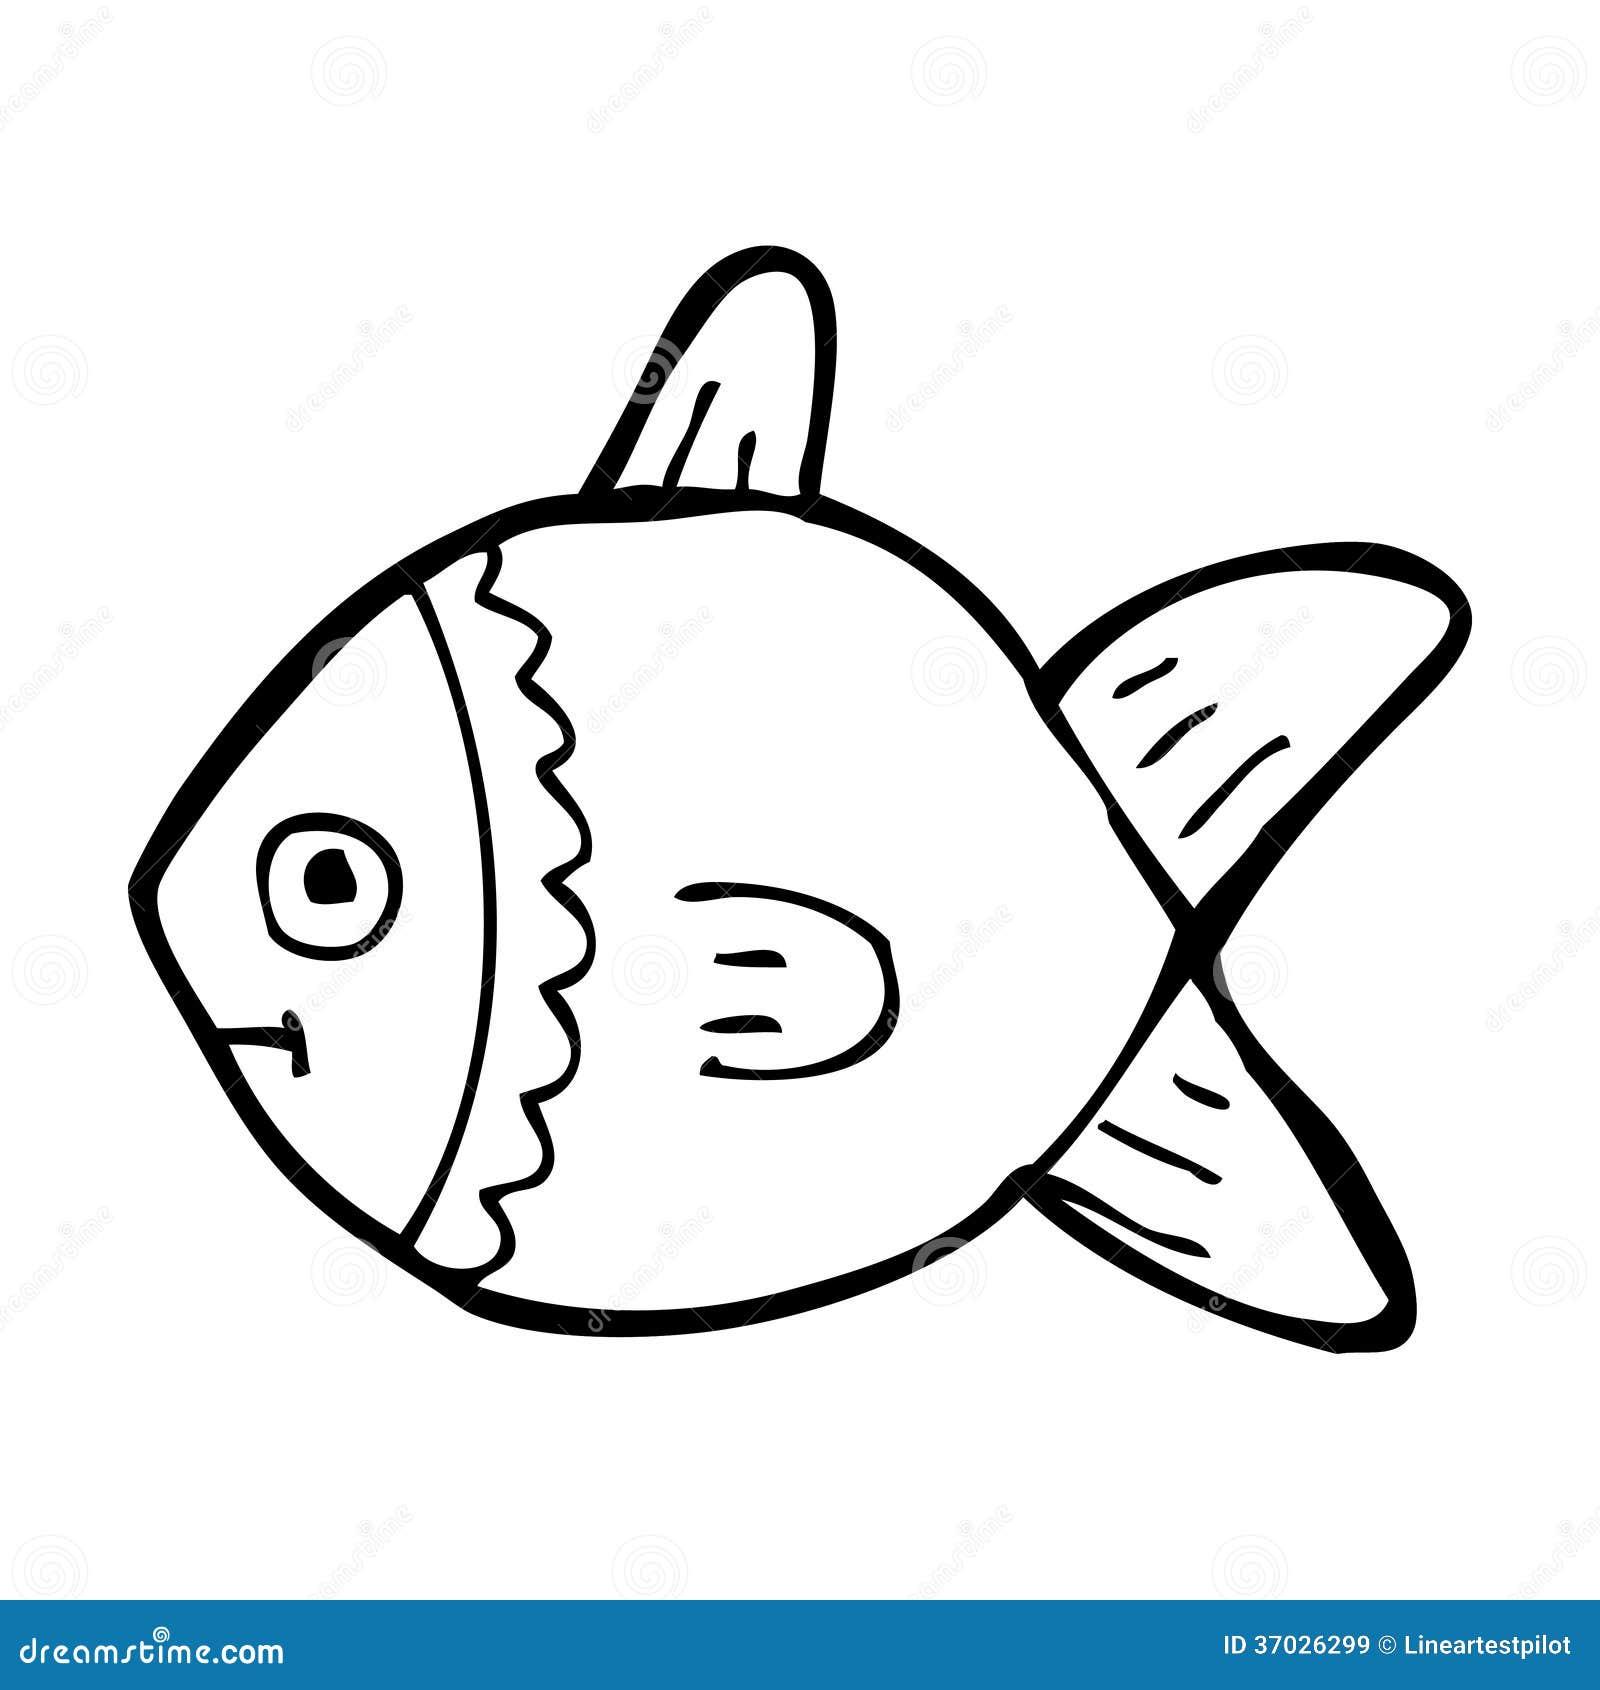 cartoon fish clipart black and white - photo #35